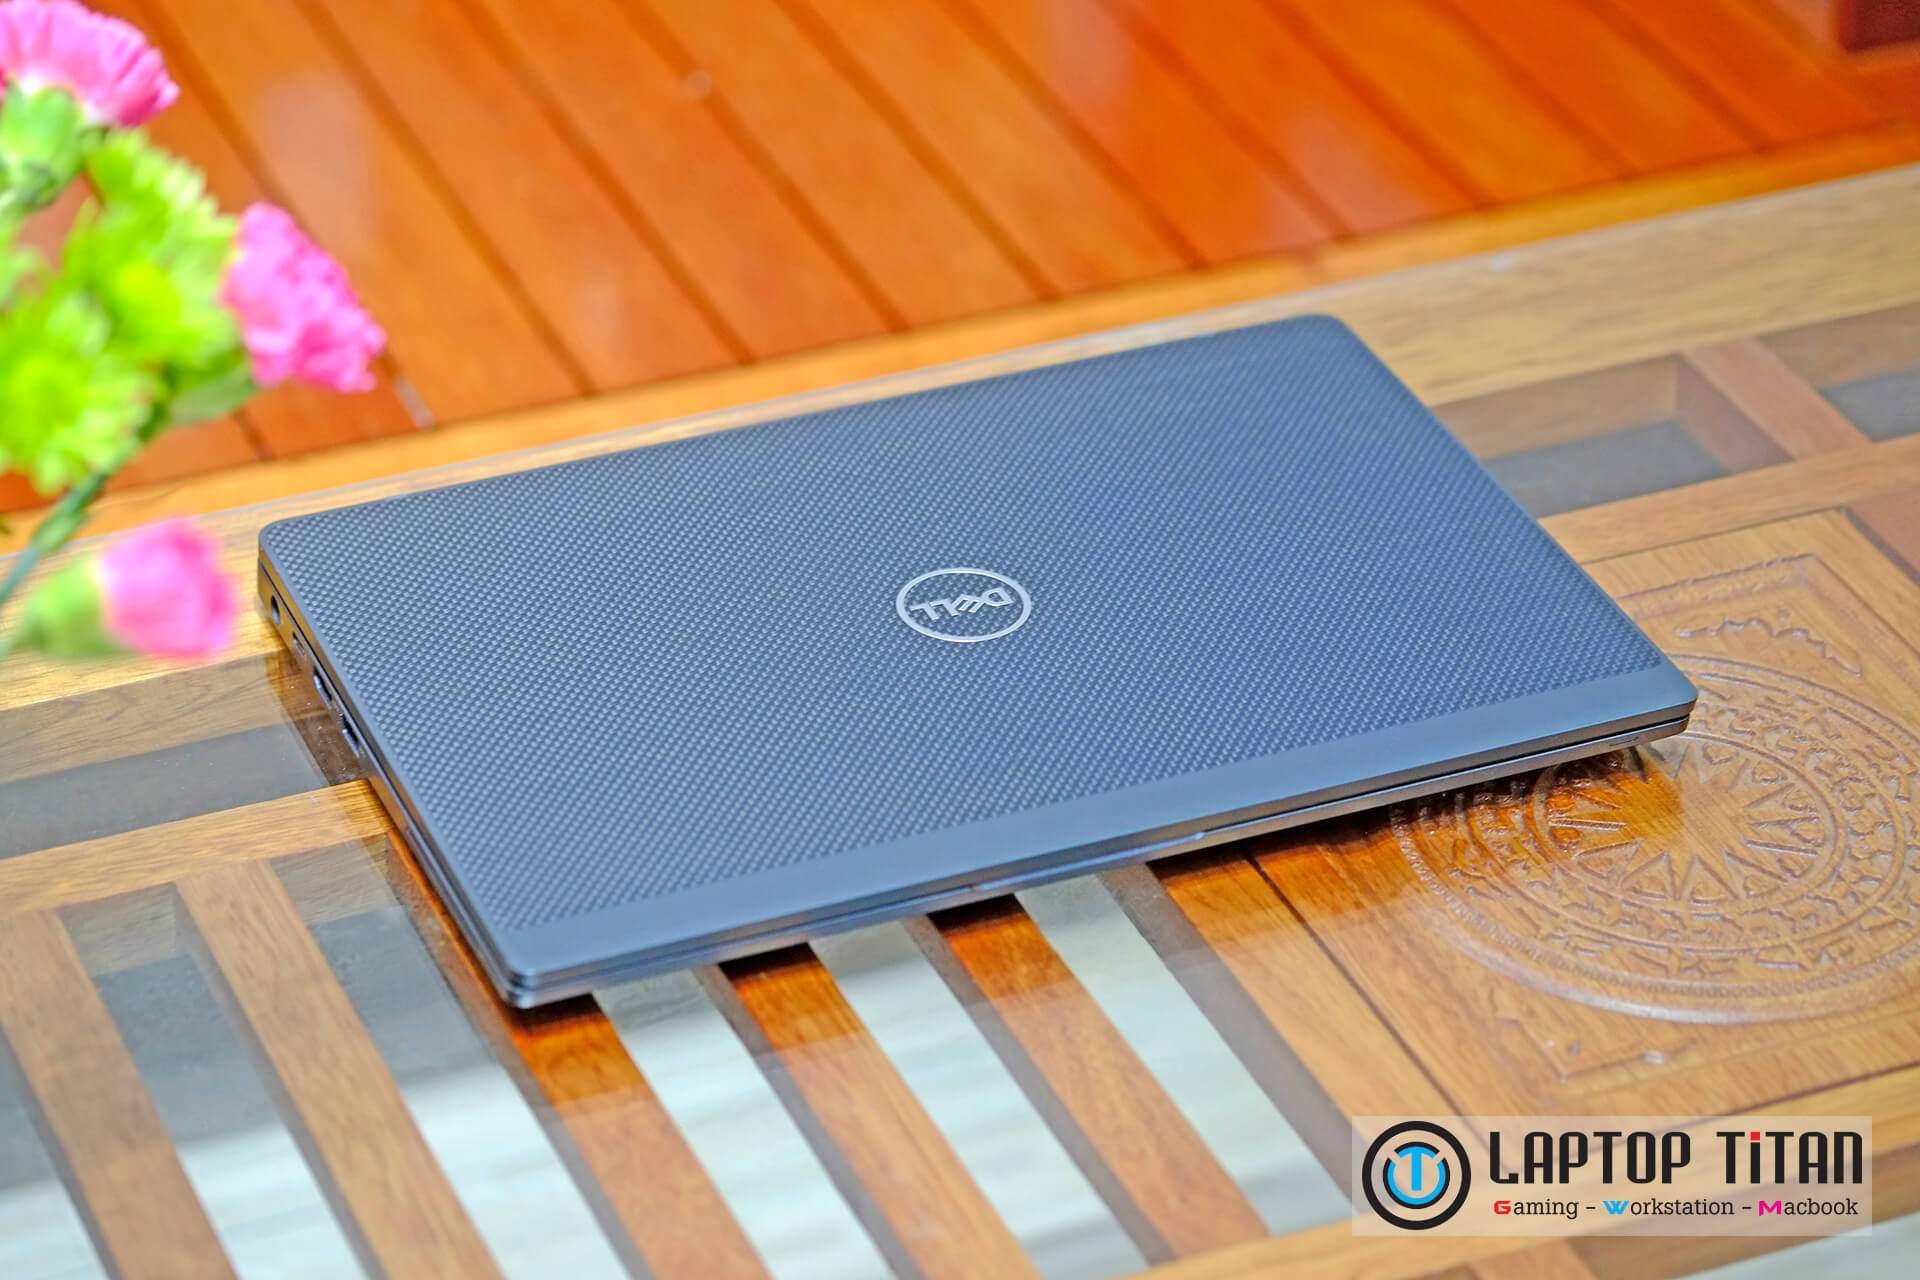 Dell Latitude 7400 Laptoptitan 02